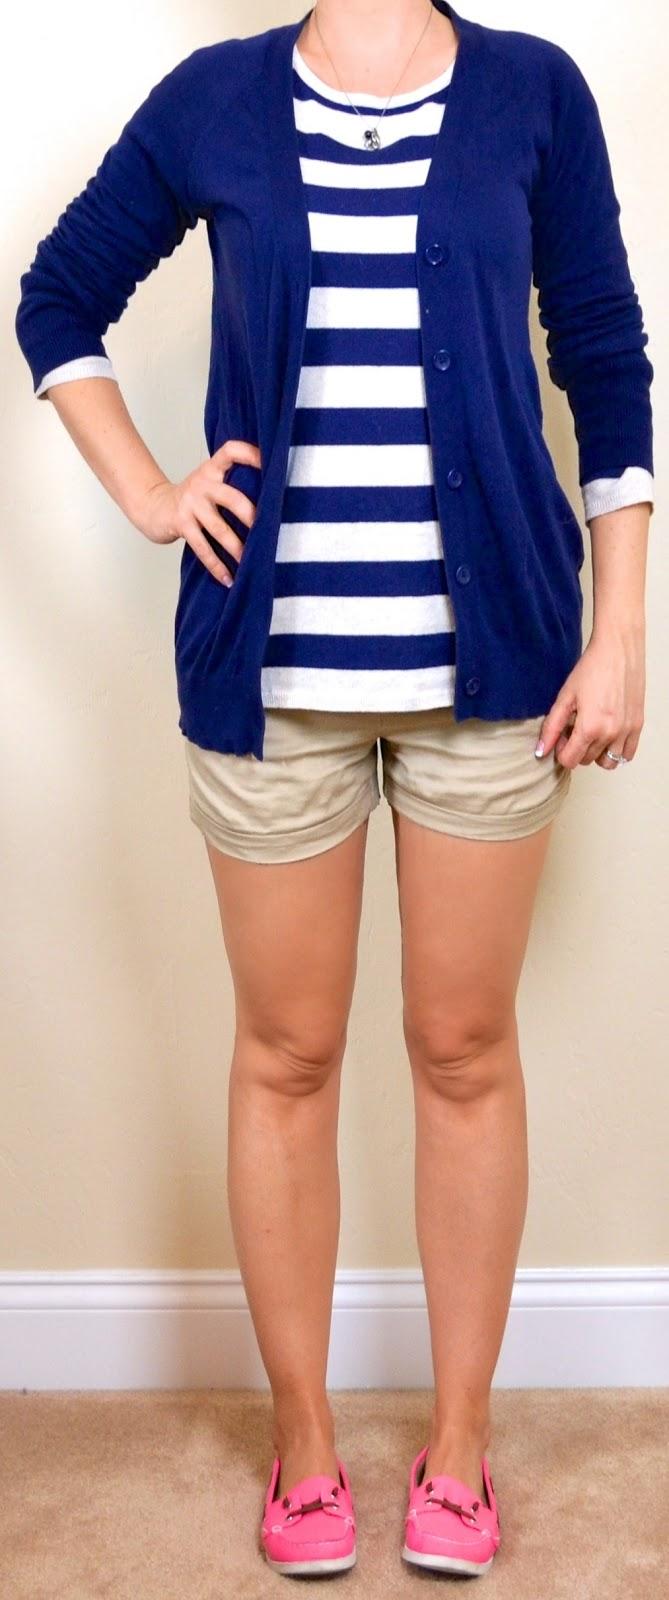 outfit post  striped sweater 31b061b4b